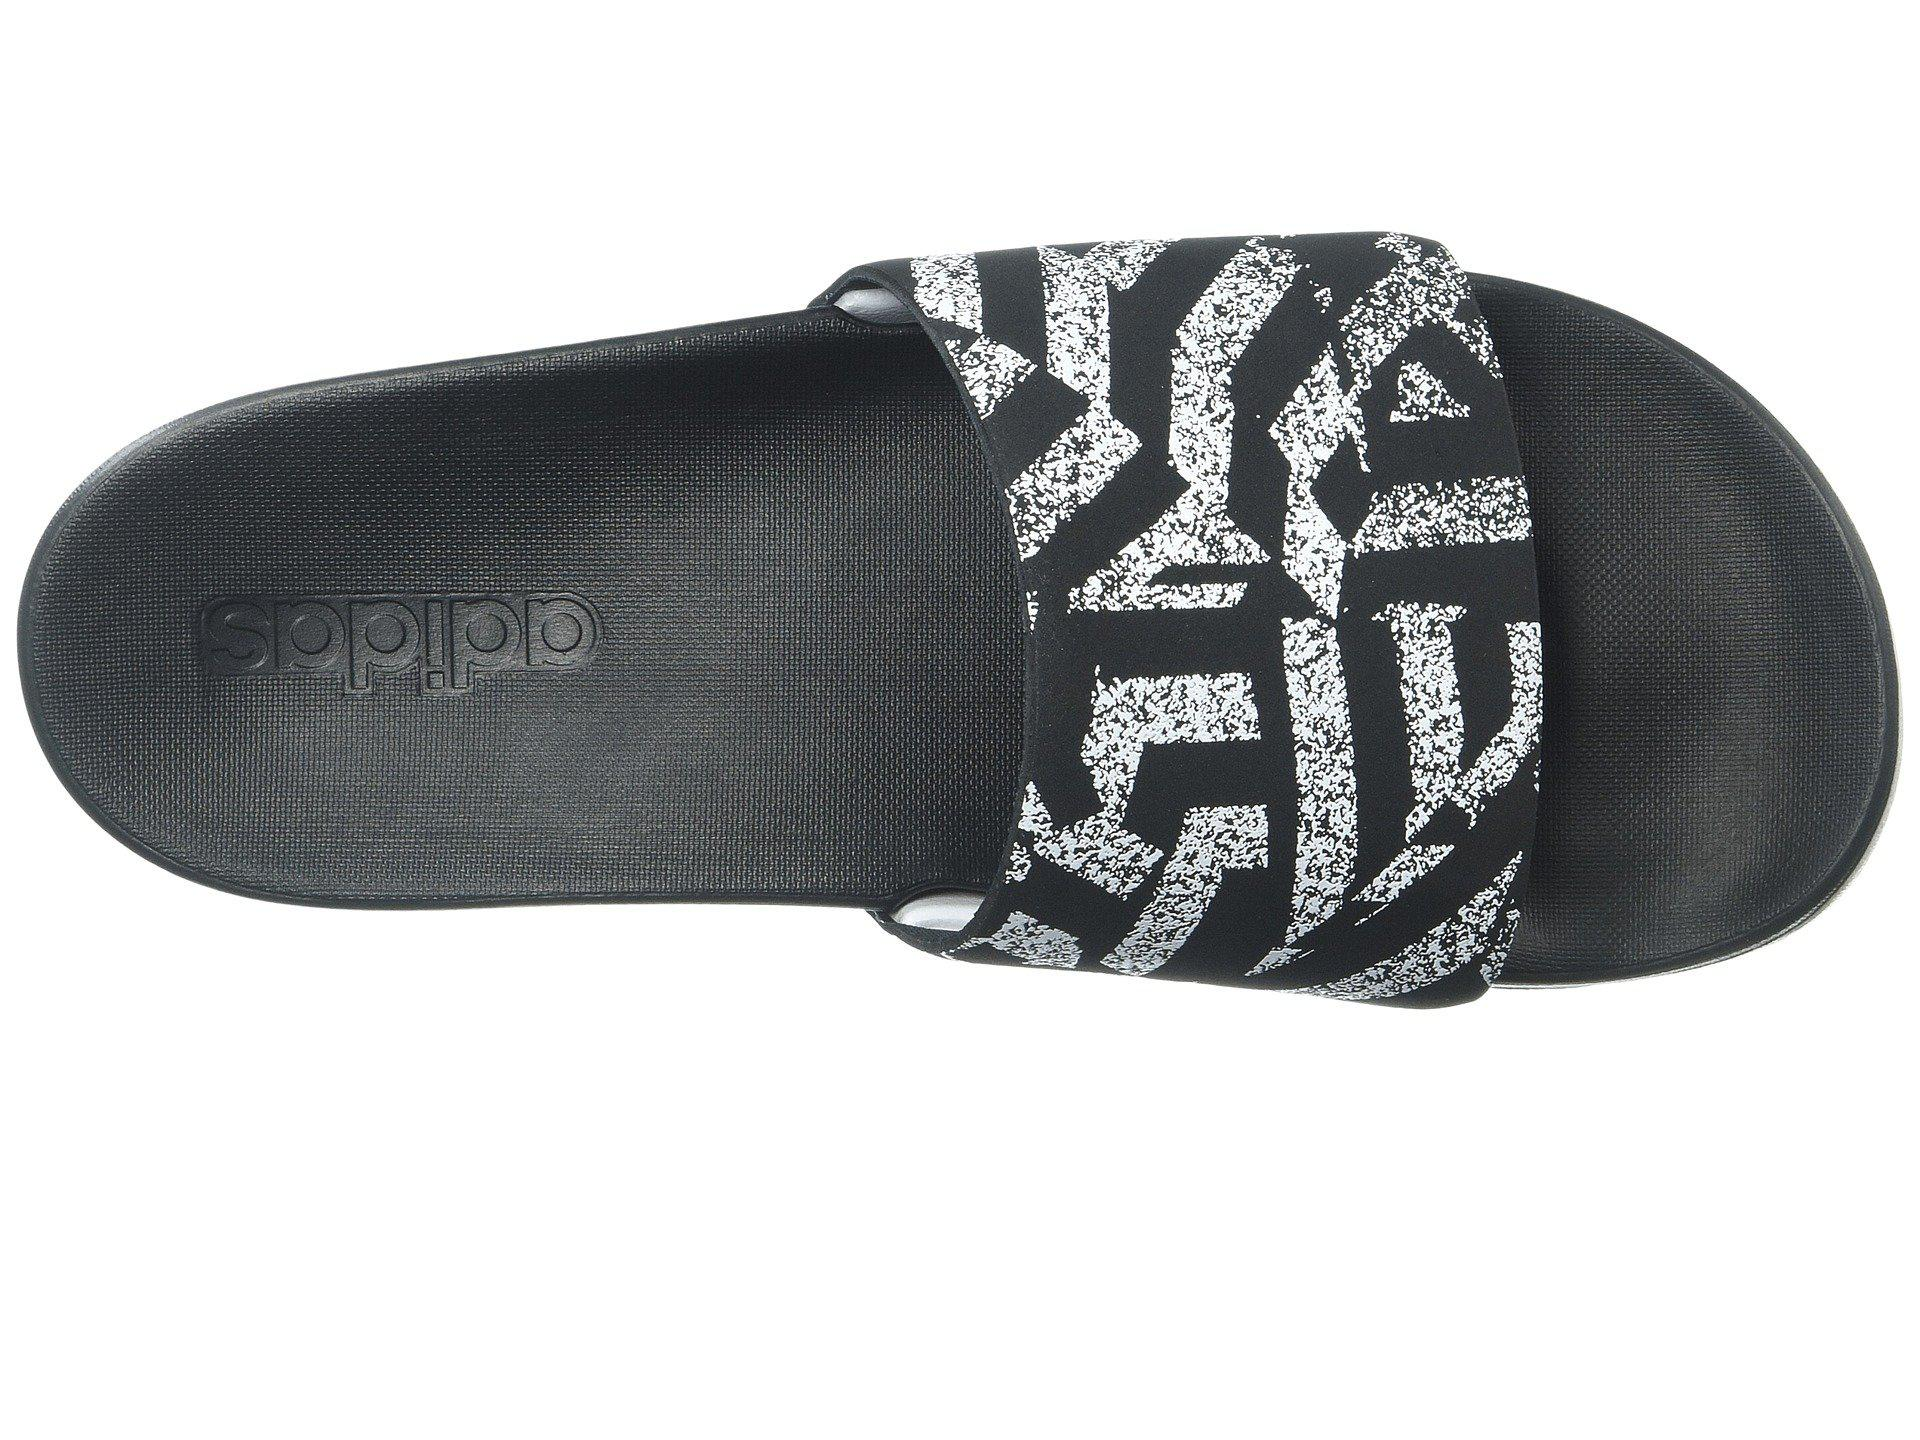 Lyst adidas adilette cf + link gr (nero / bianco / nero) donne